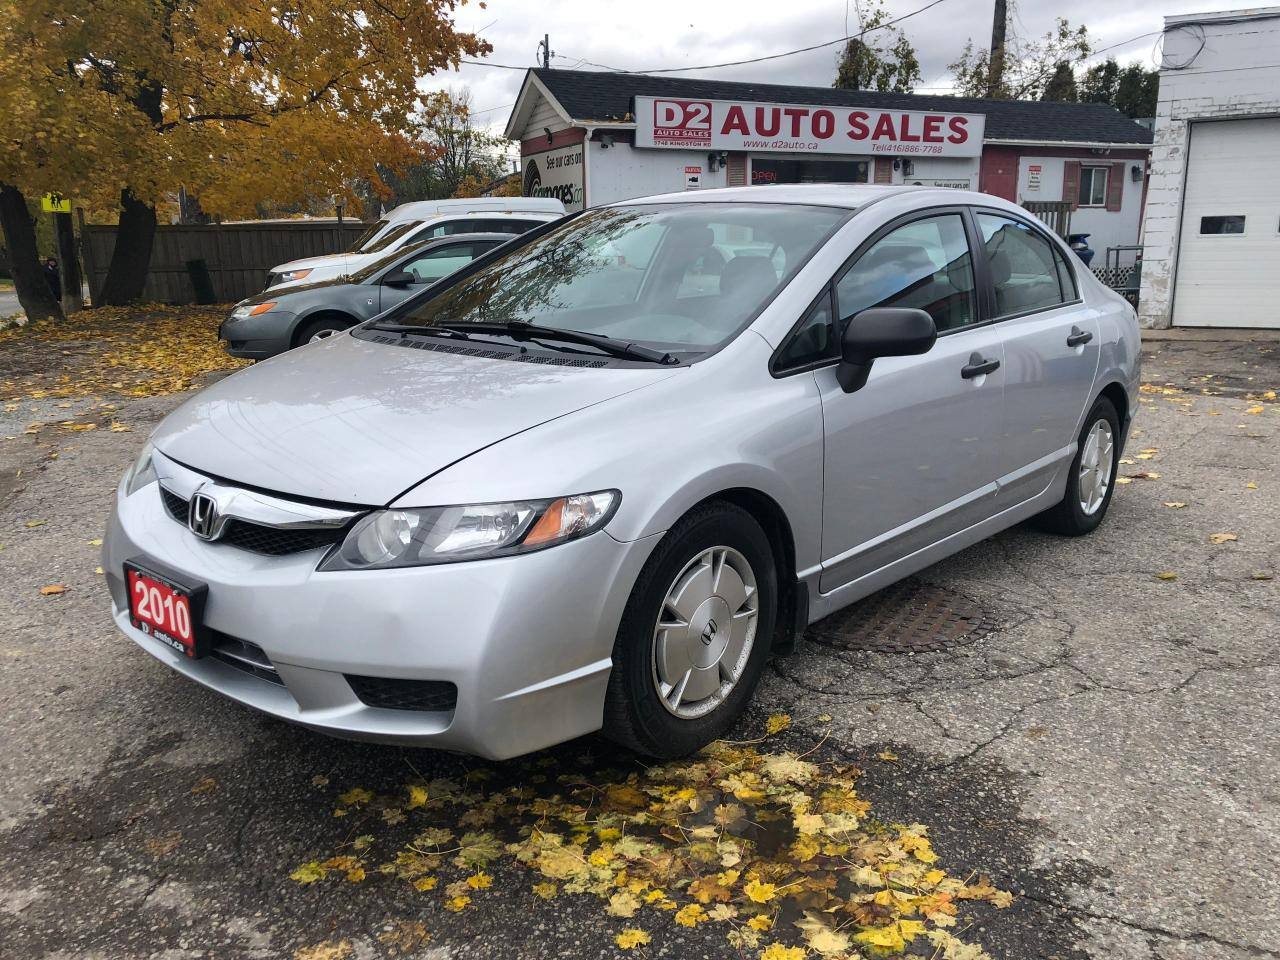 2010 Honda Civic Certified/Automatic/Gas Saver/Low KM